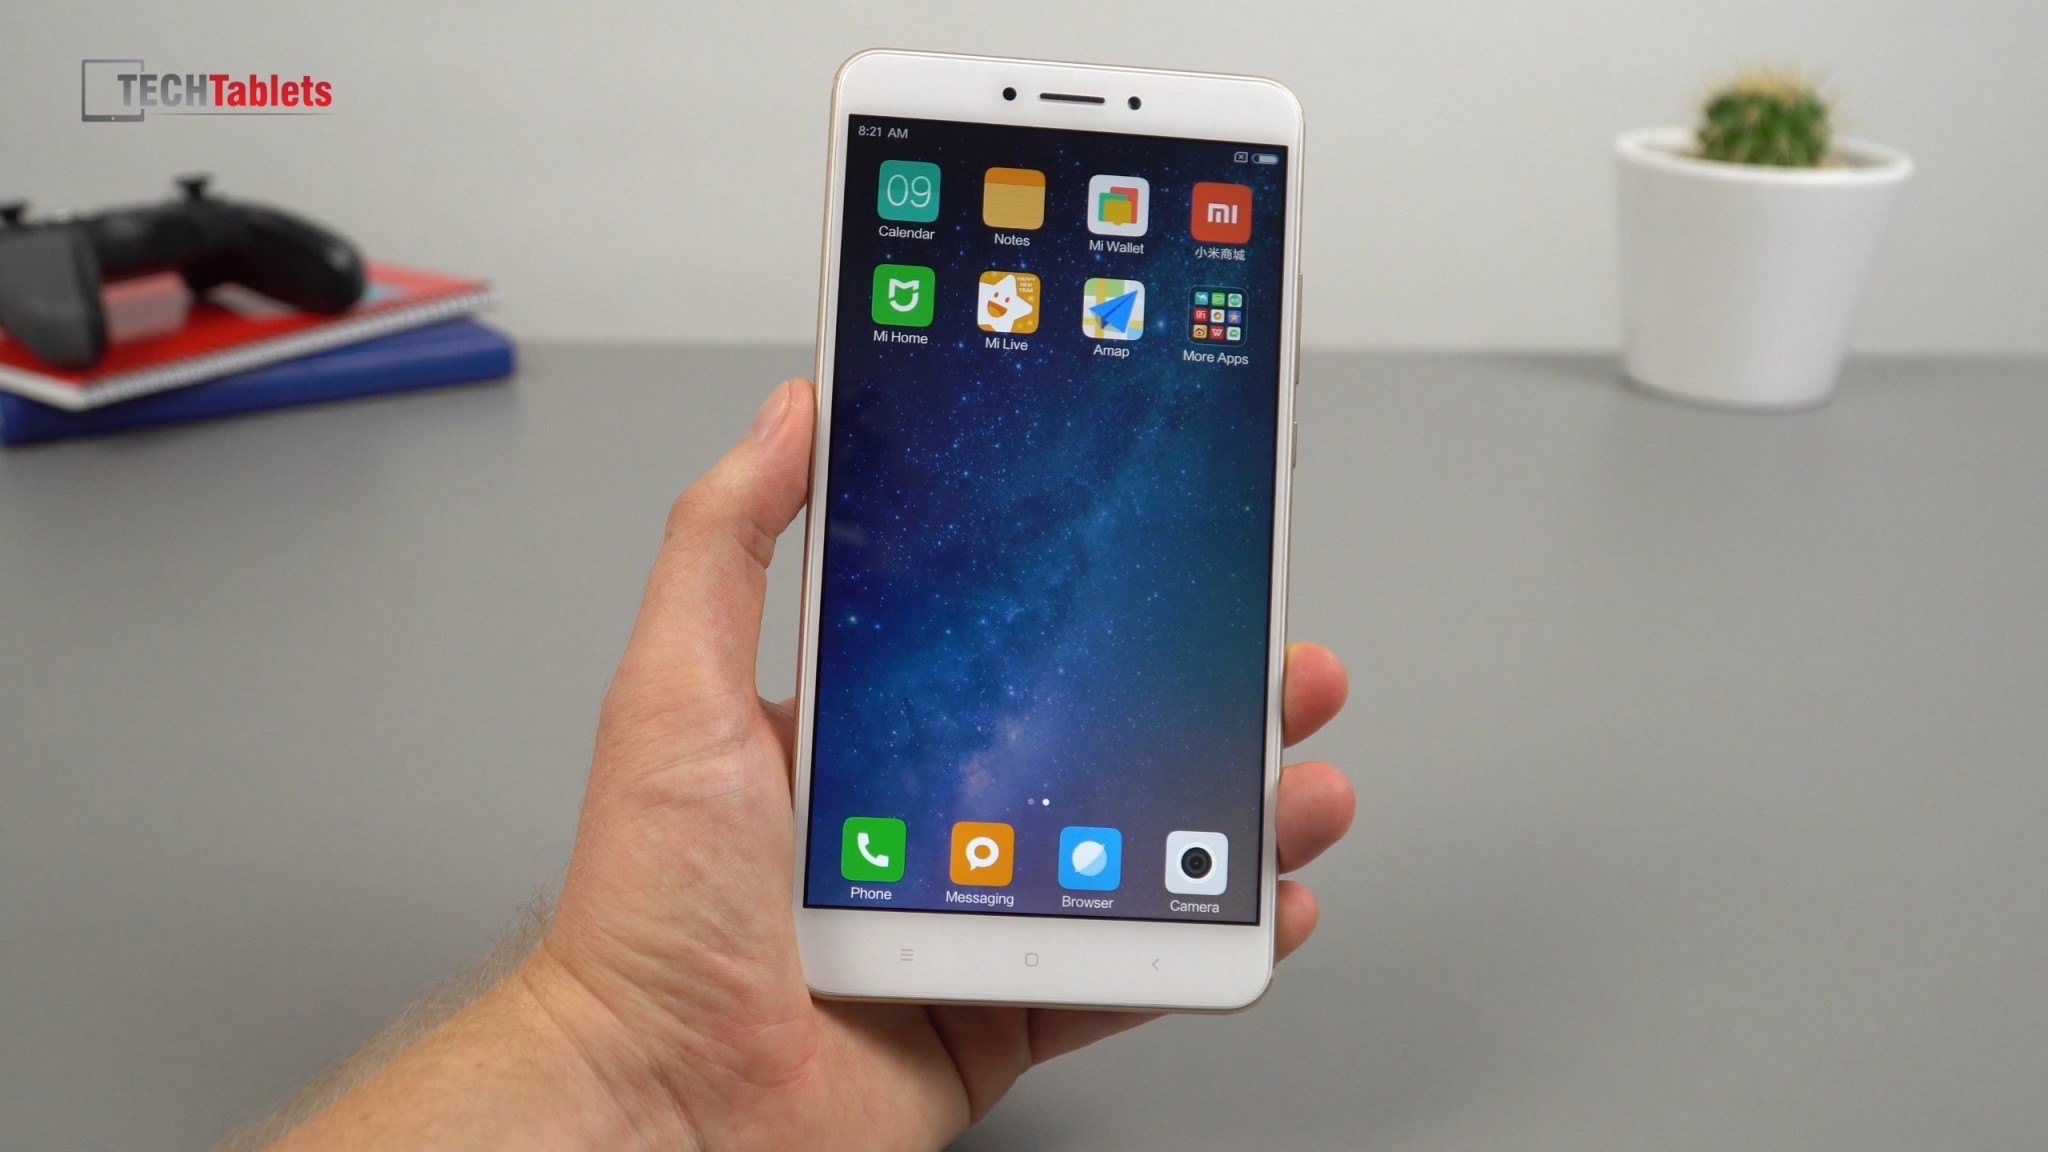 Xiaomi Mi Max 2 Techtablets